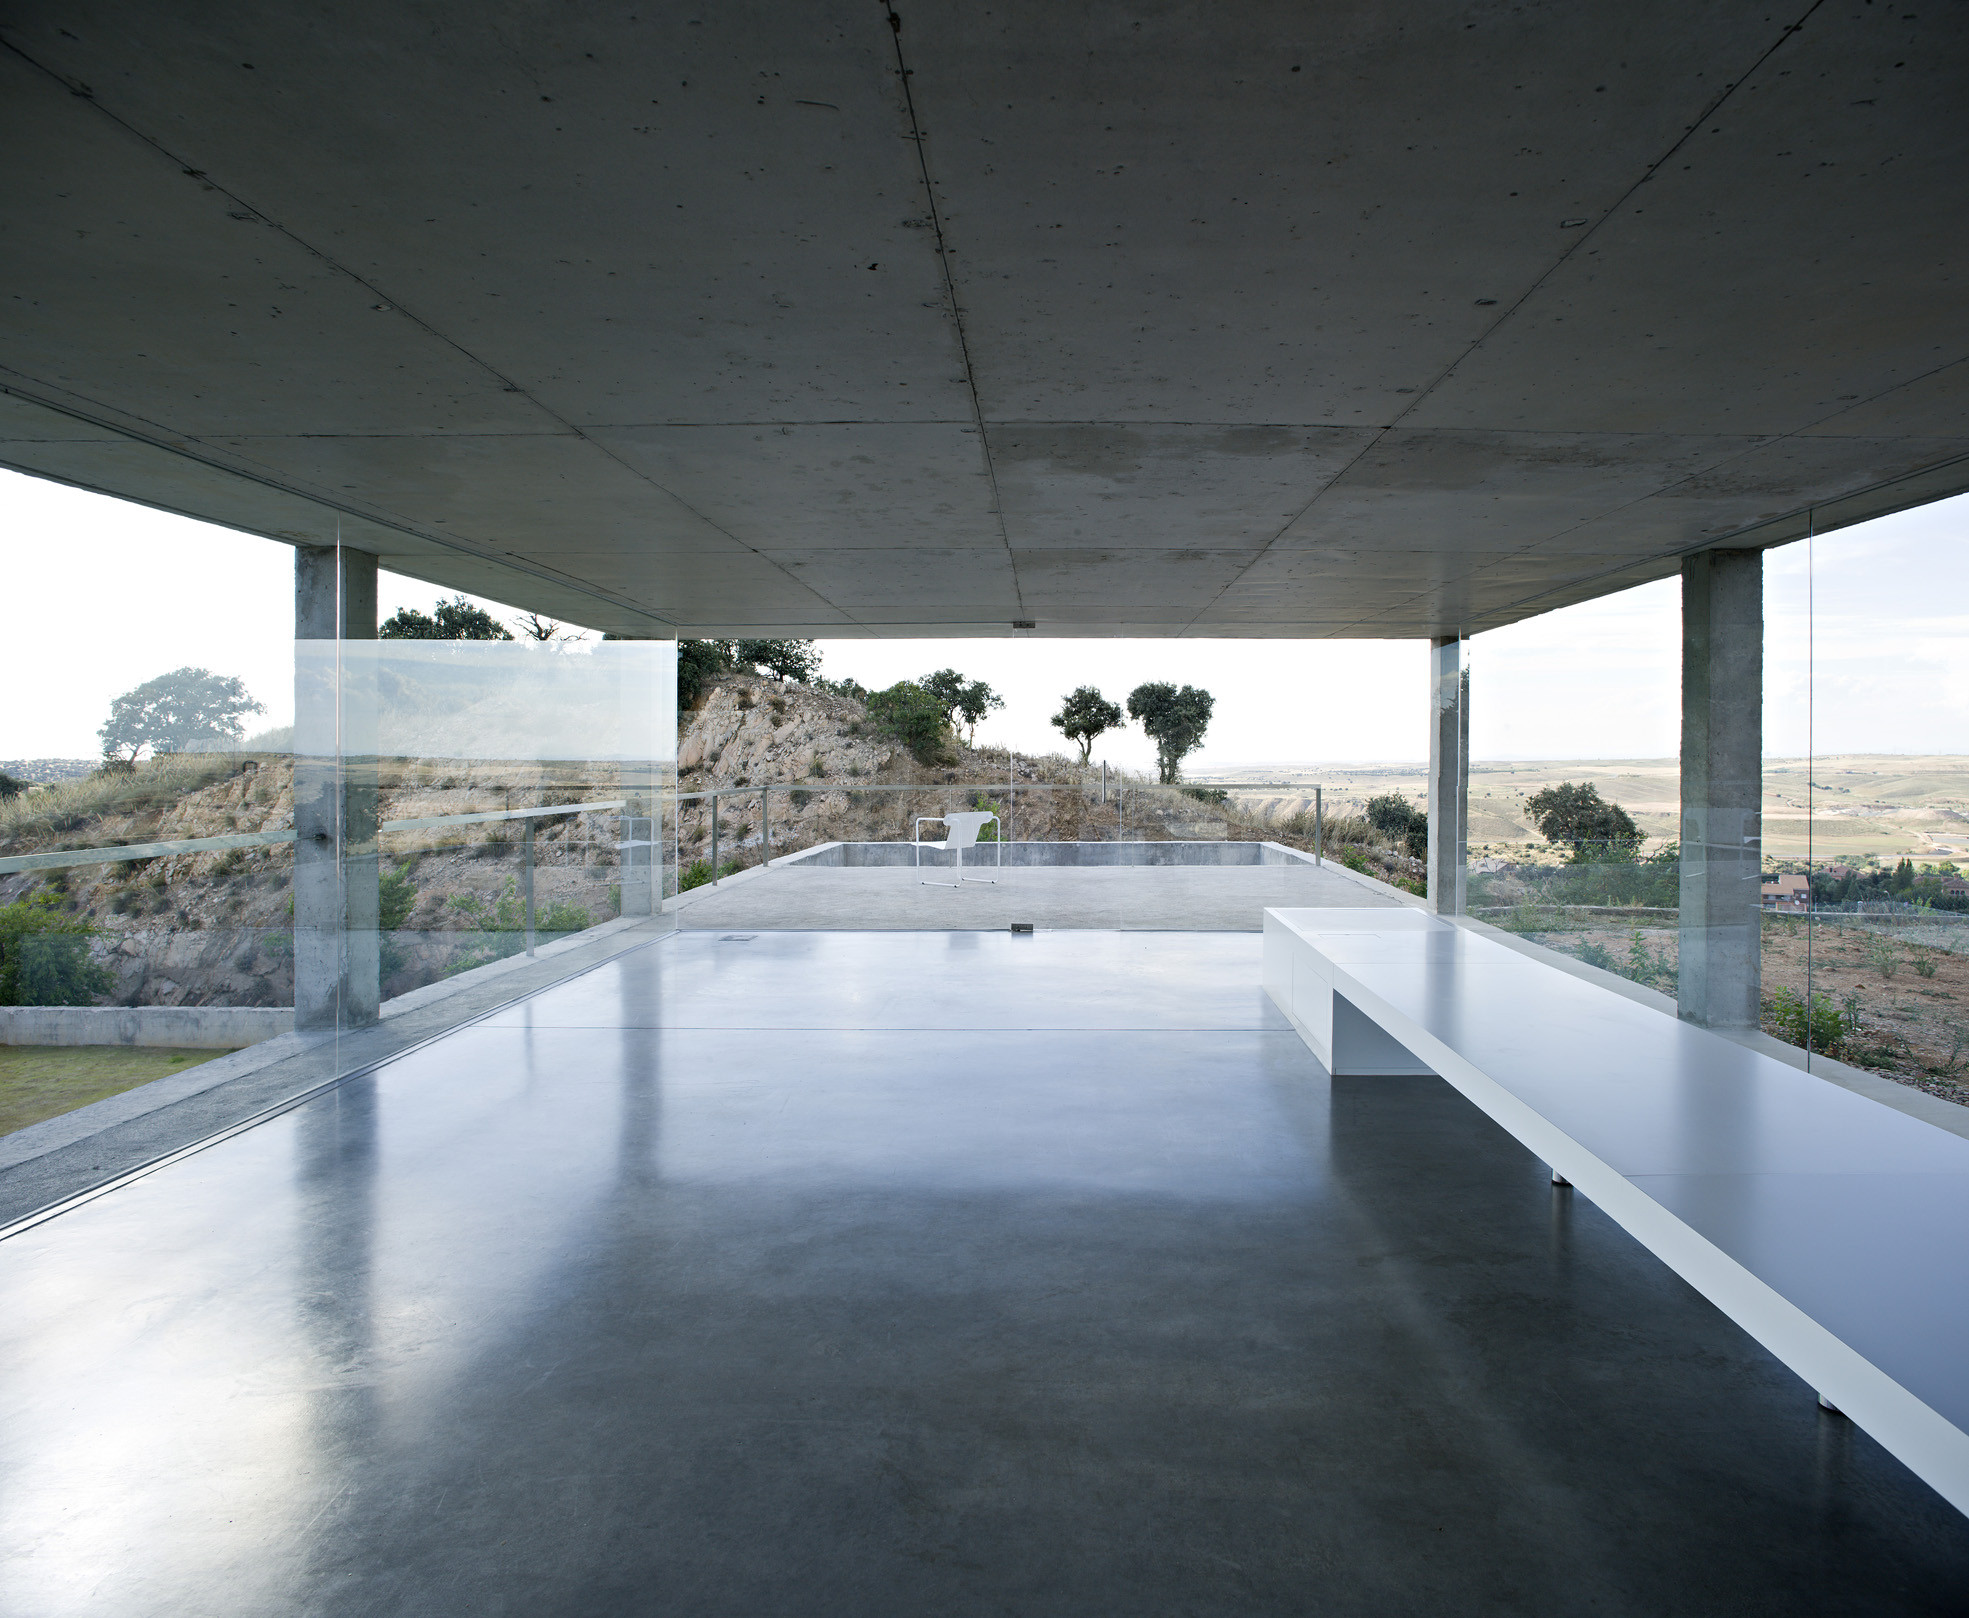 Gallery of rufo house alberto campo baeza 2 for Casa de campo arquitectura